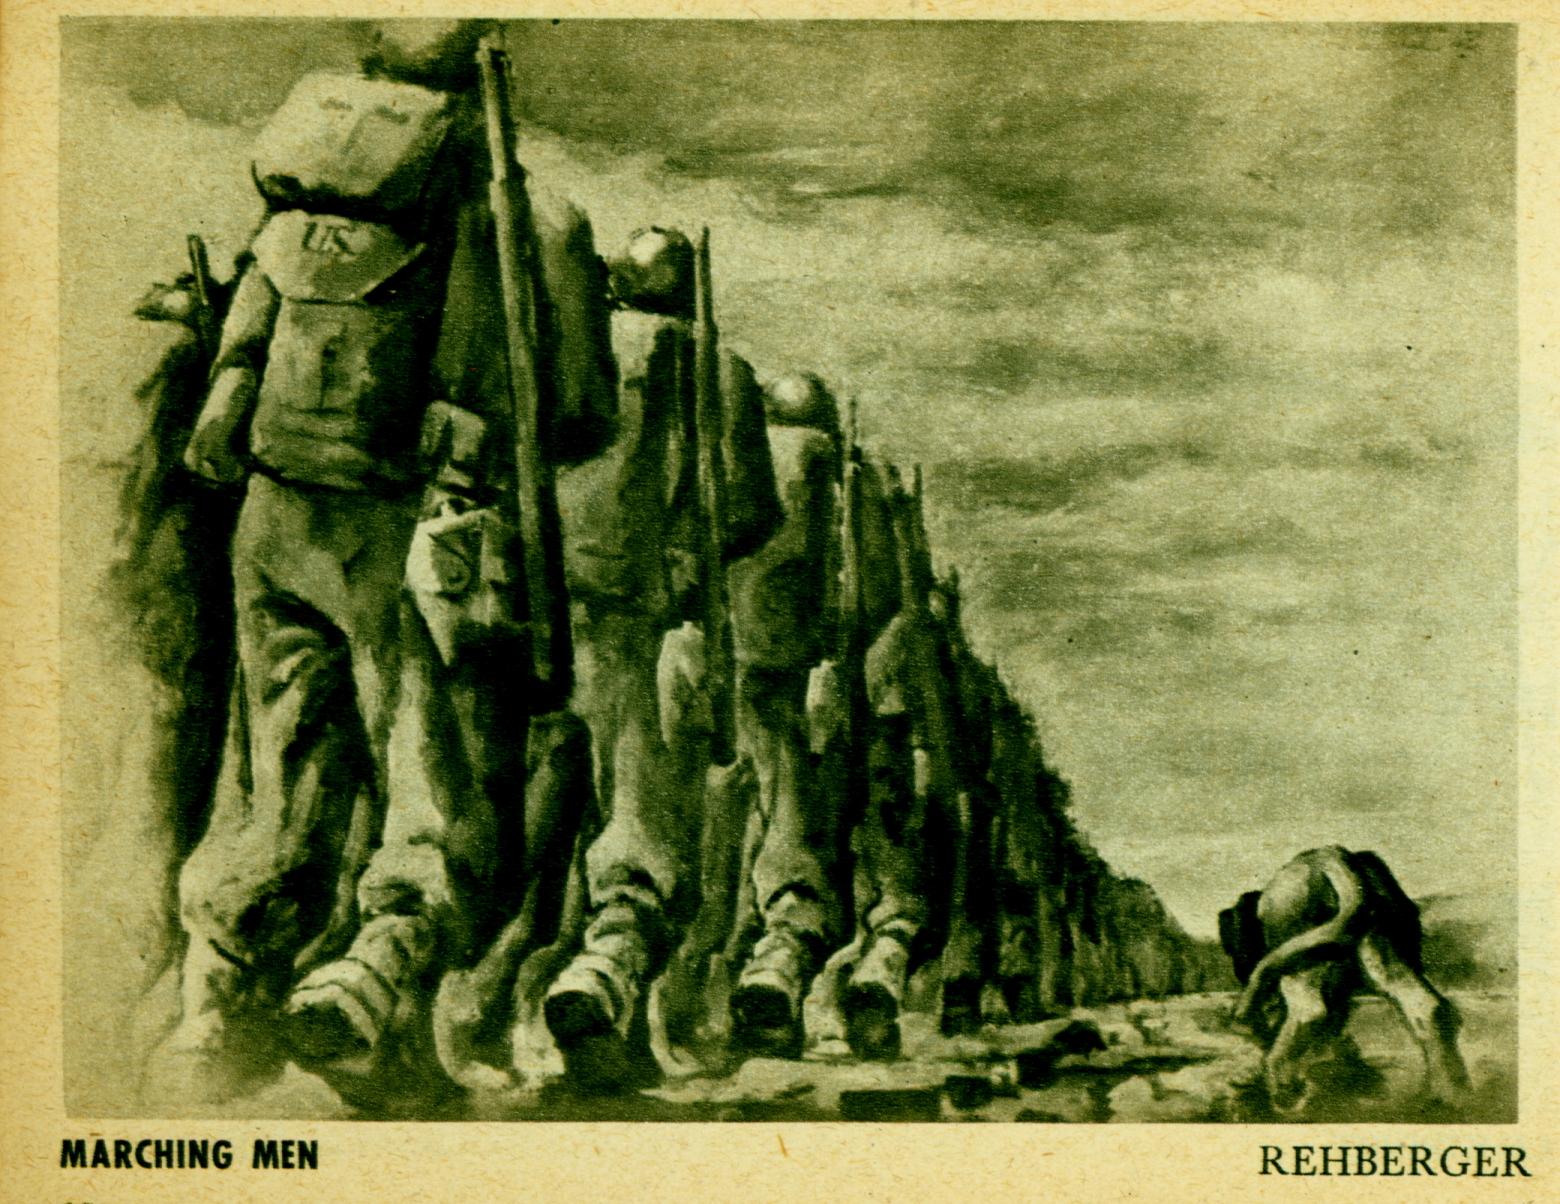 G. I. Sketch Book - July 1944 Infantry Journal - Penguin Books